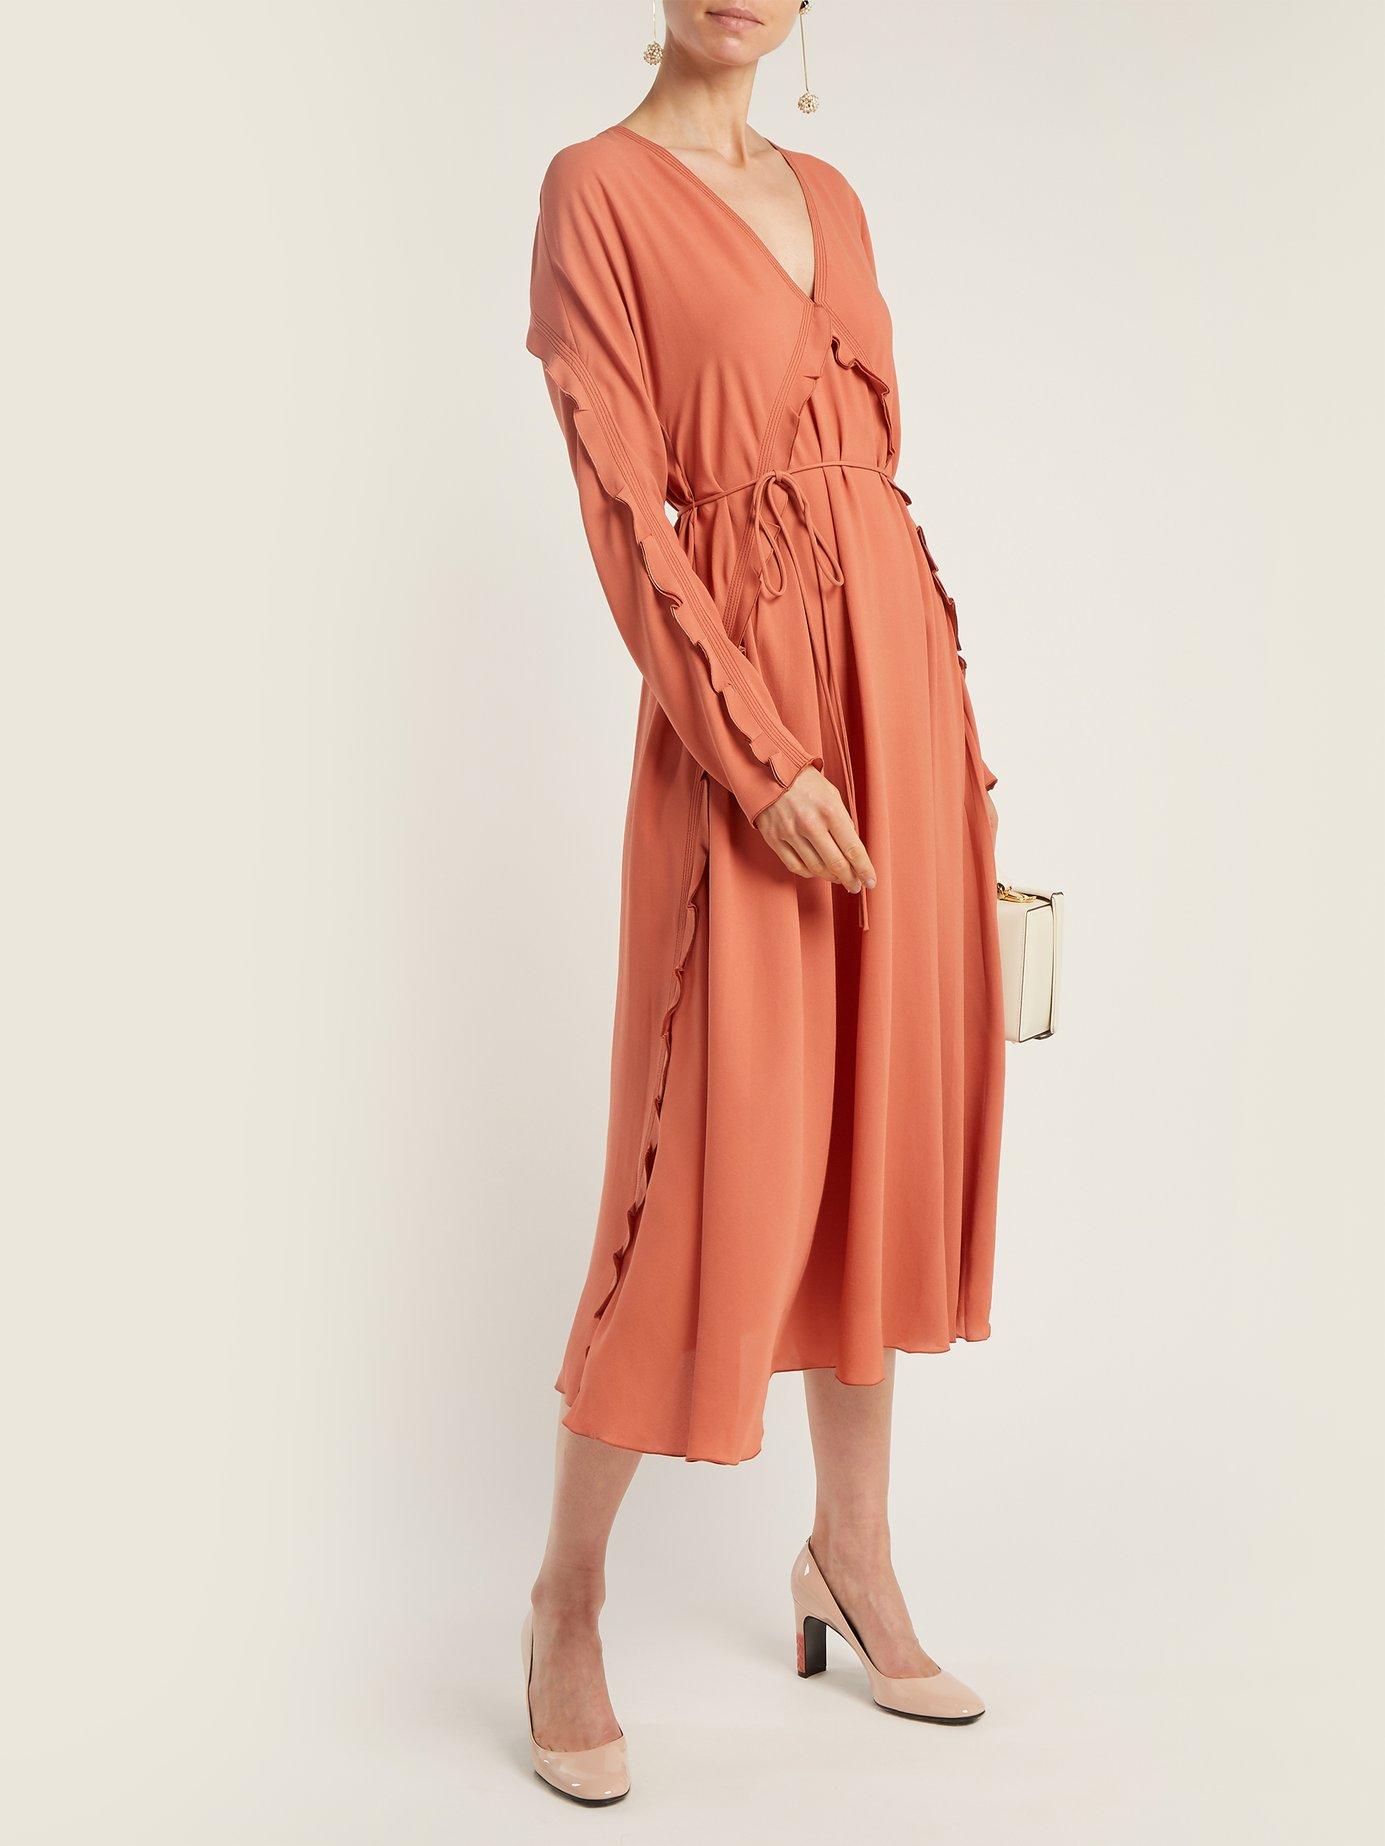 Ruffle-trimmed silk dress by Bottega Veneta